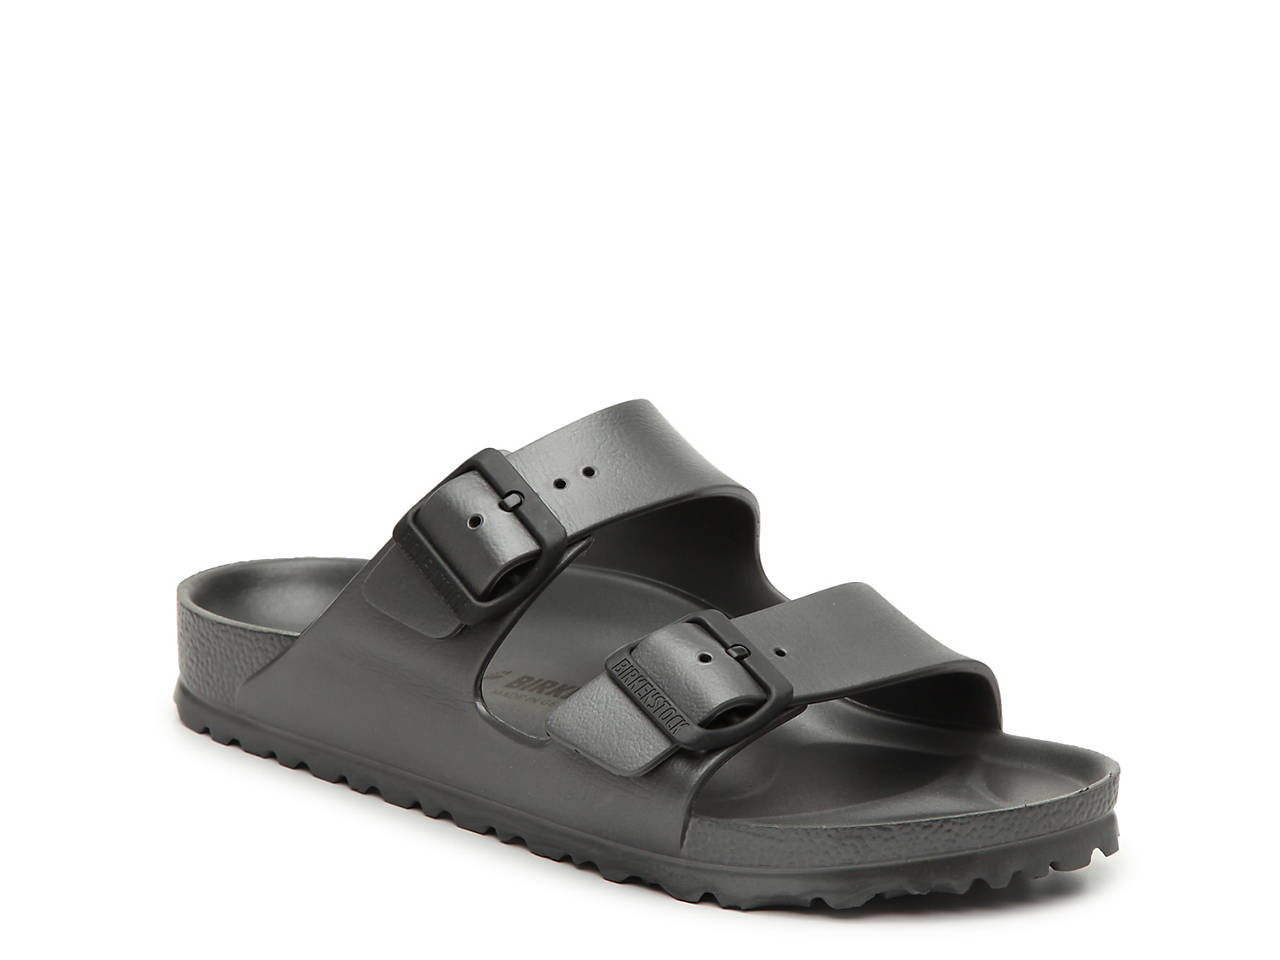 47f0c042b253 Birkenstock Arizona Essentials Slide Sandal - Women s Women s Shoes ...